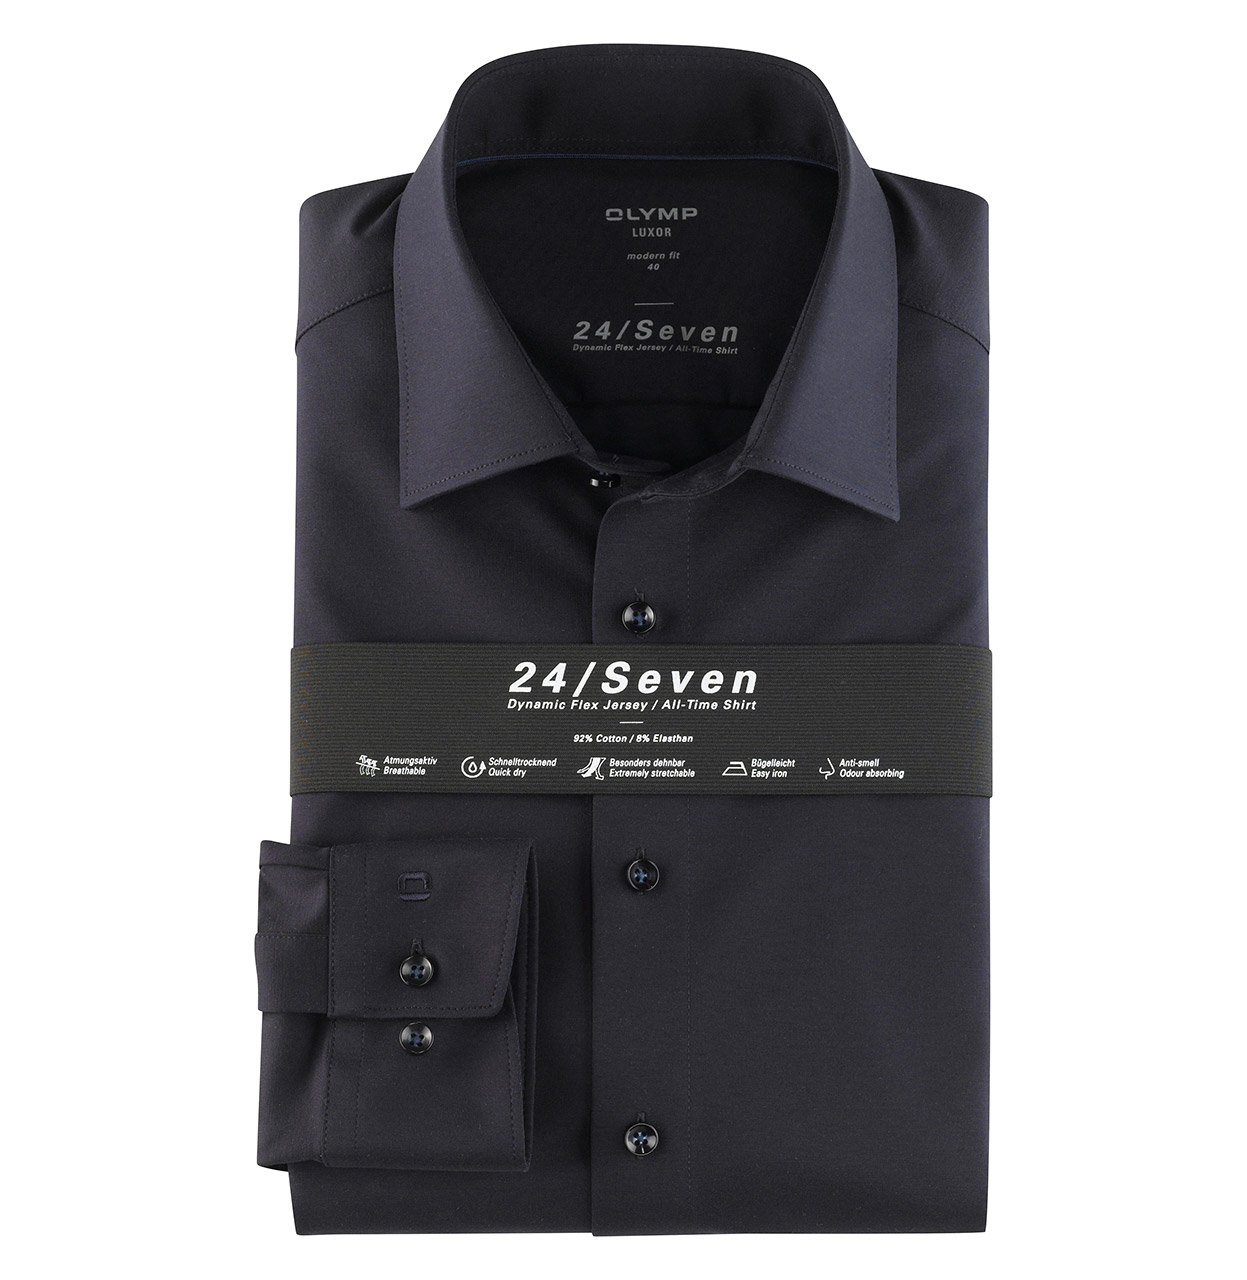 OLYMP Shirt 120264 18 1 120264 marine Maat 43